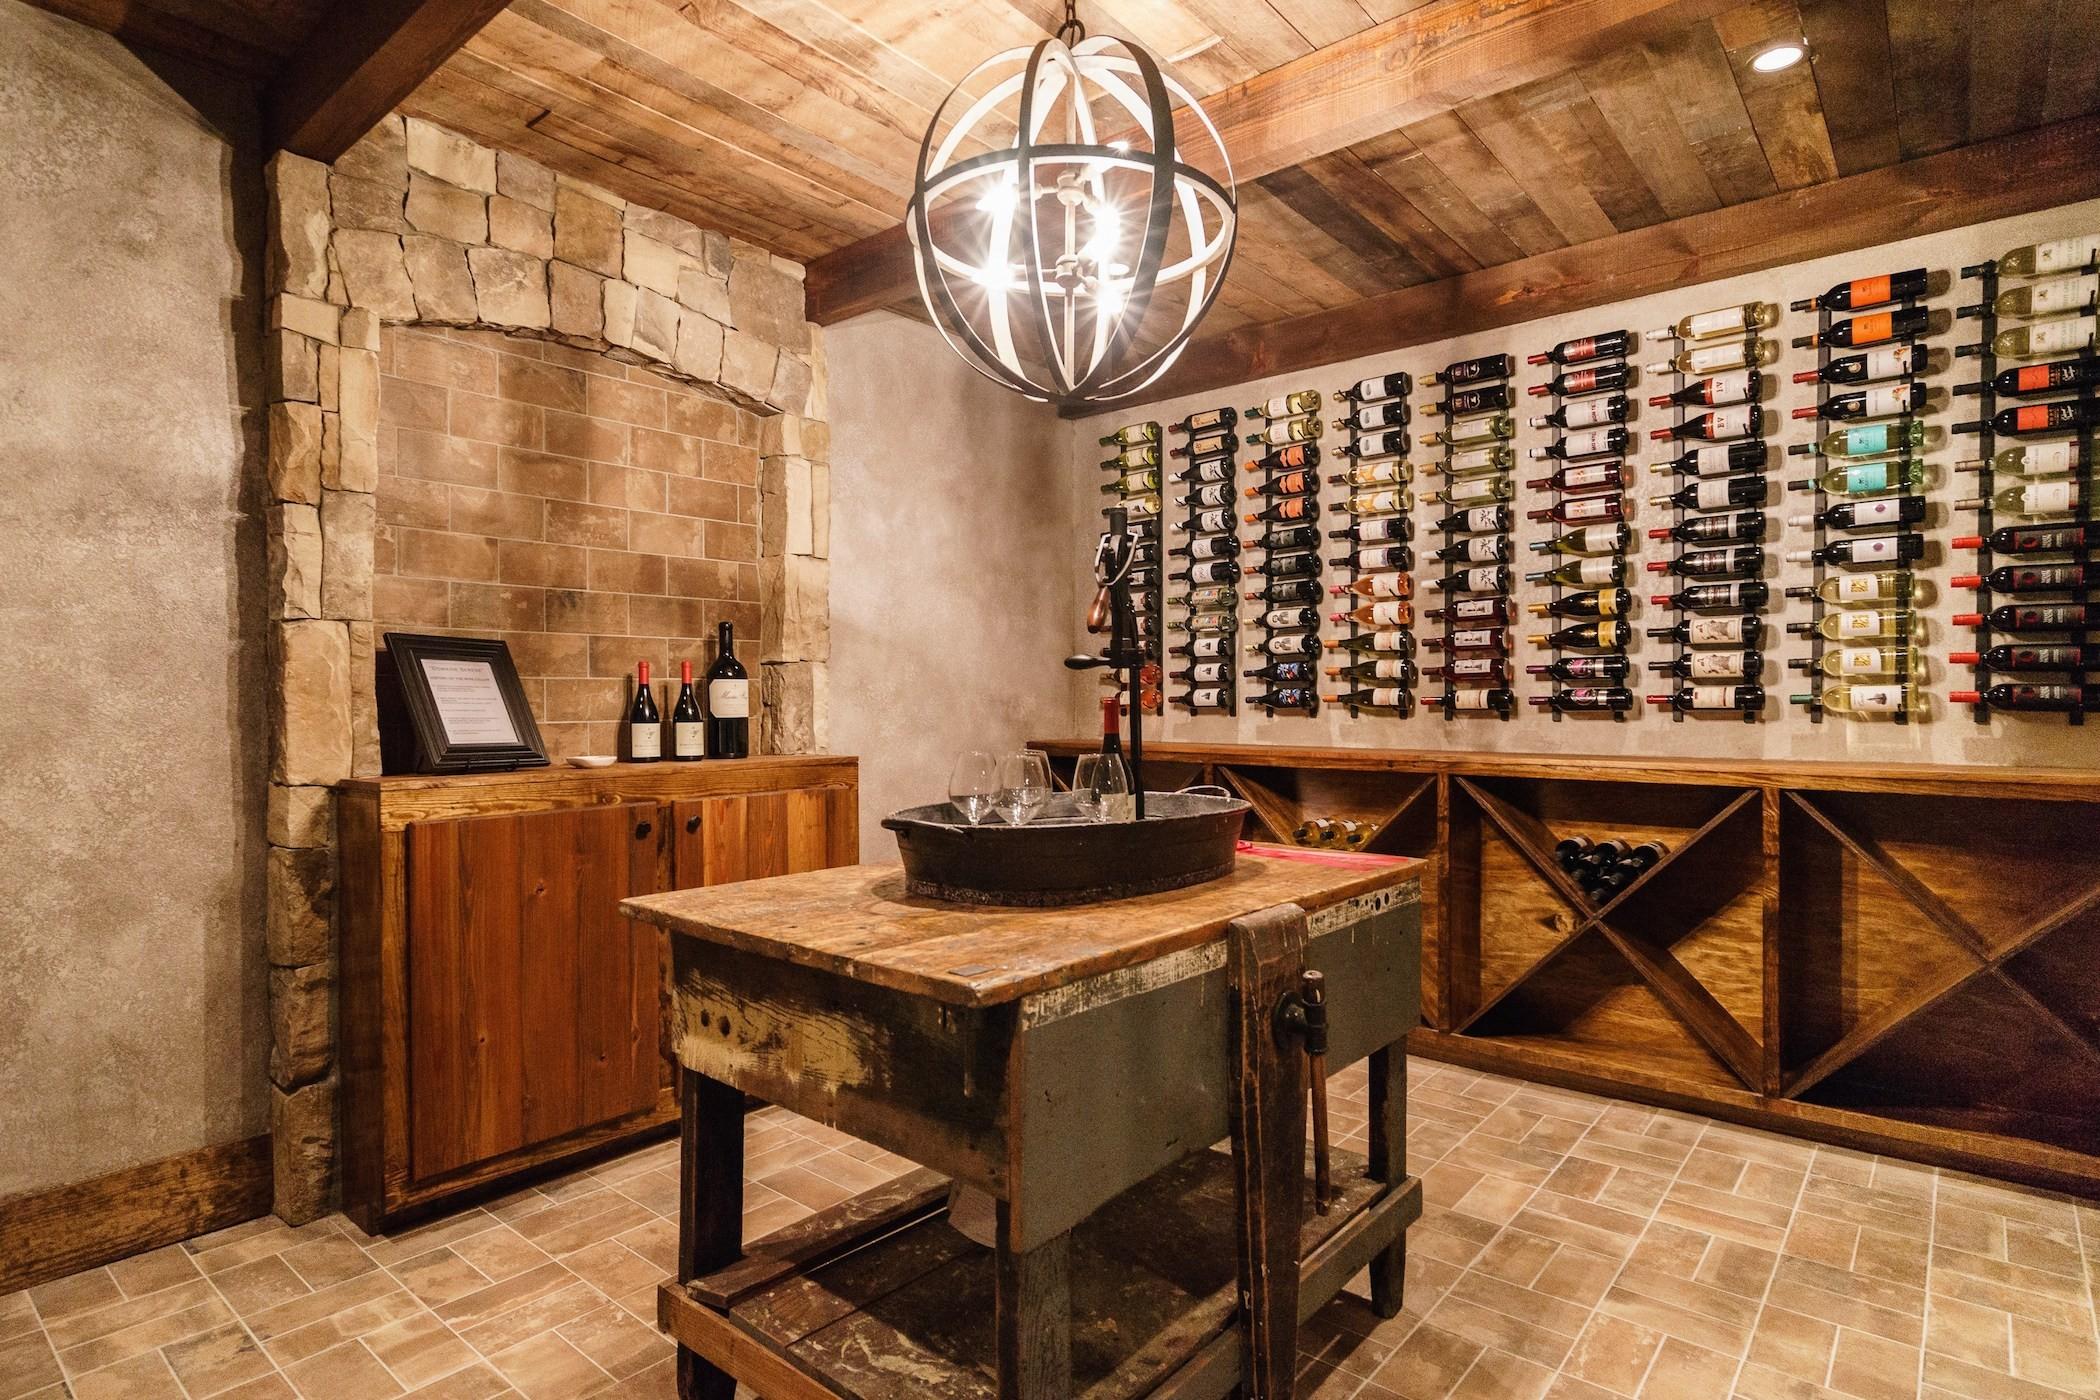 032_Wine_Cellar20170522103029